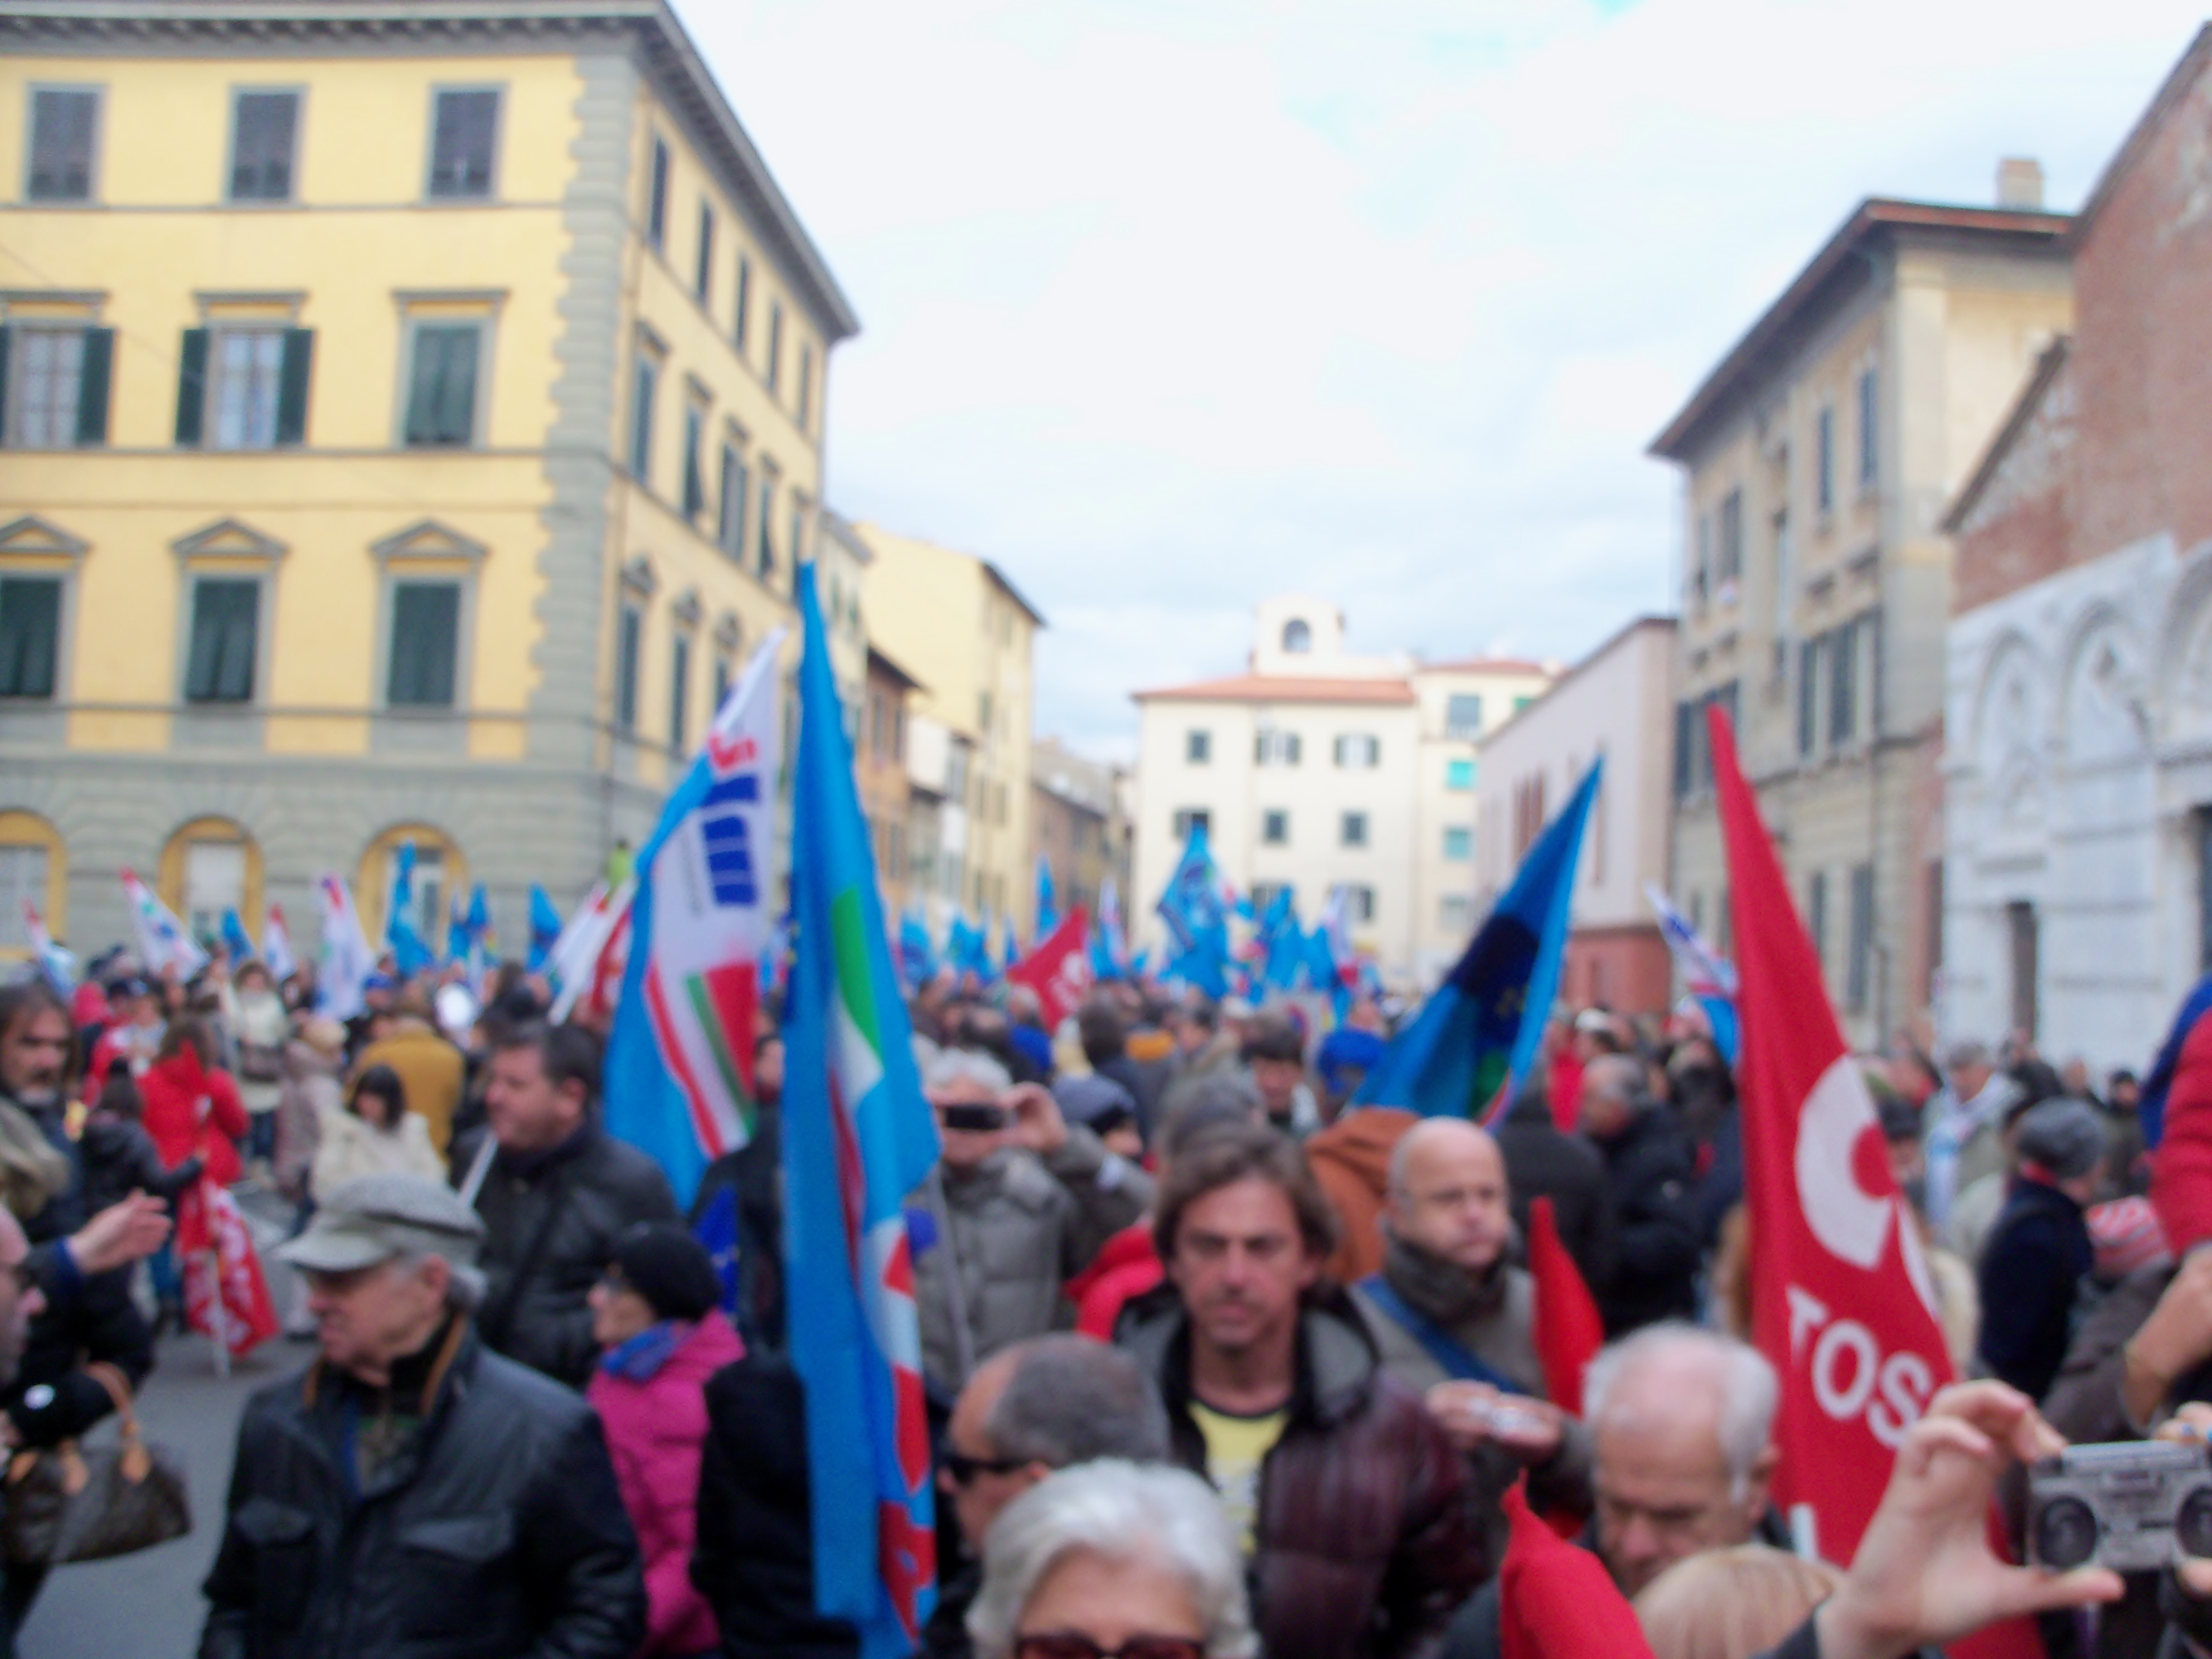 Toscana in sciopero, la piazza dice 'Basta' al Governo